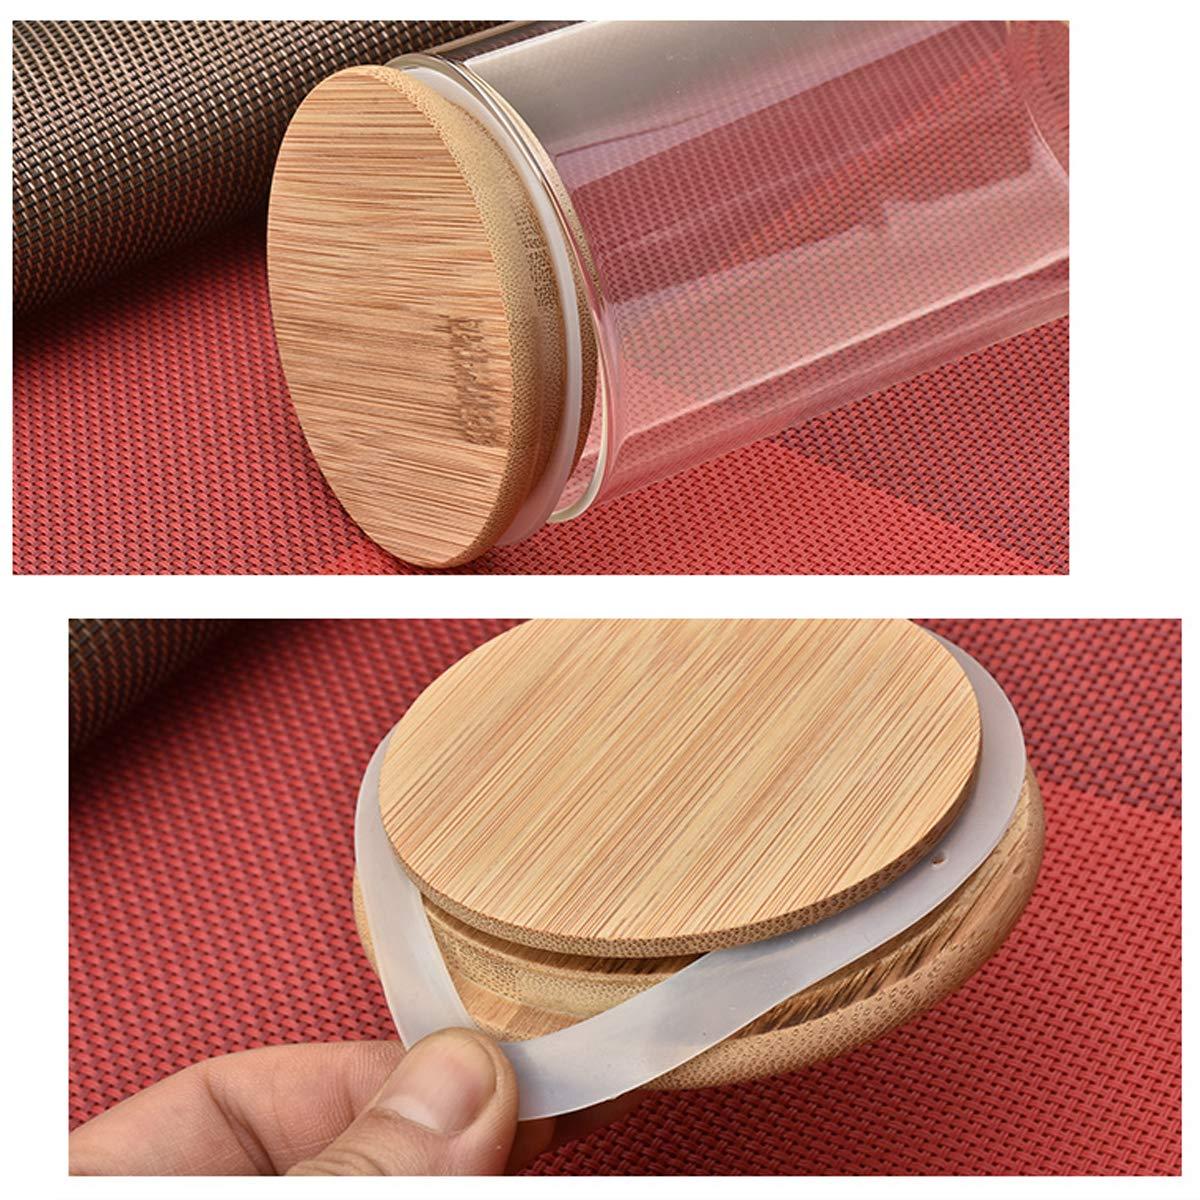 Pote De Vidro Tampa De Bambu Para Mantimentos 1000ML